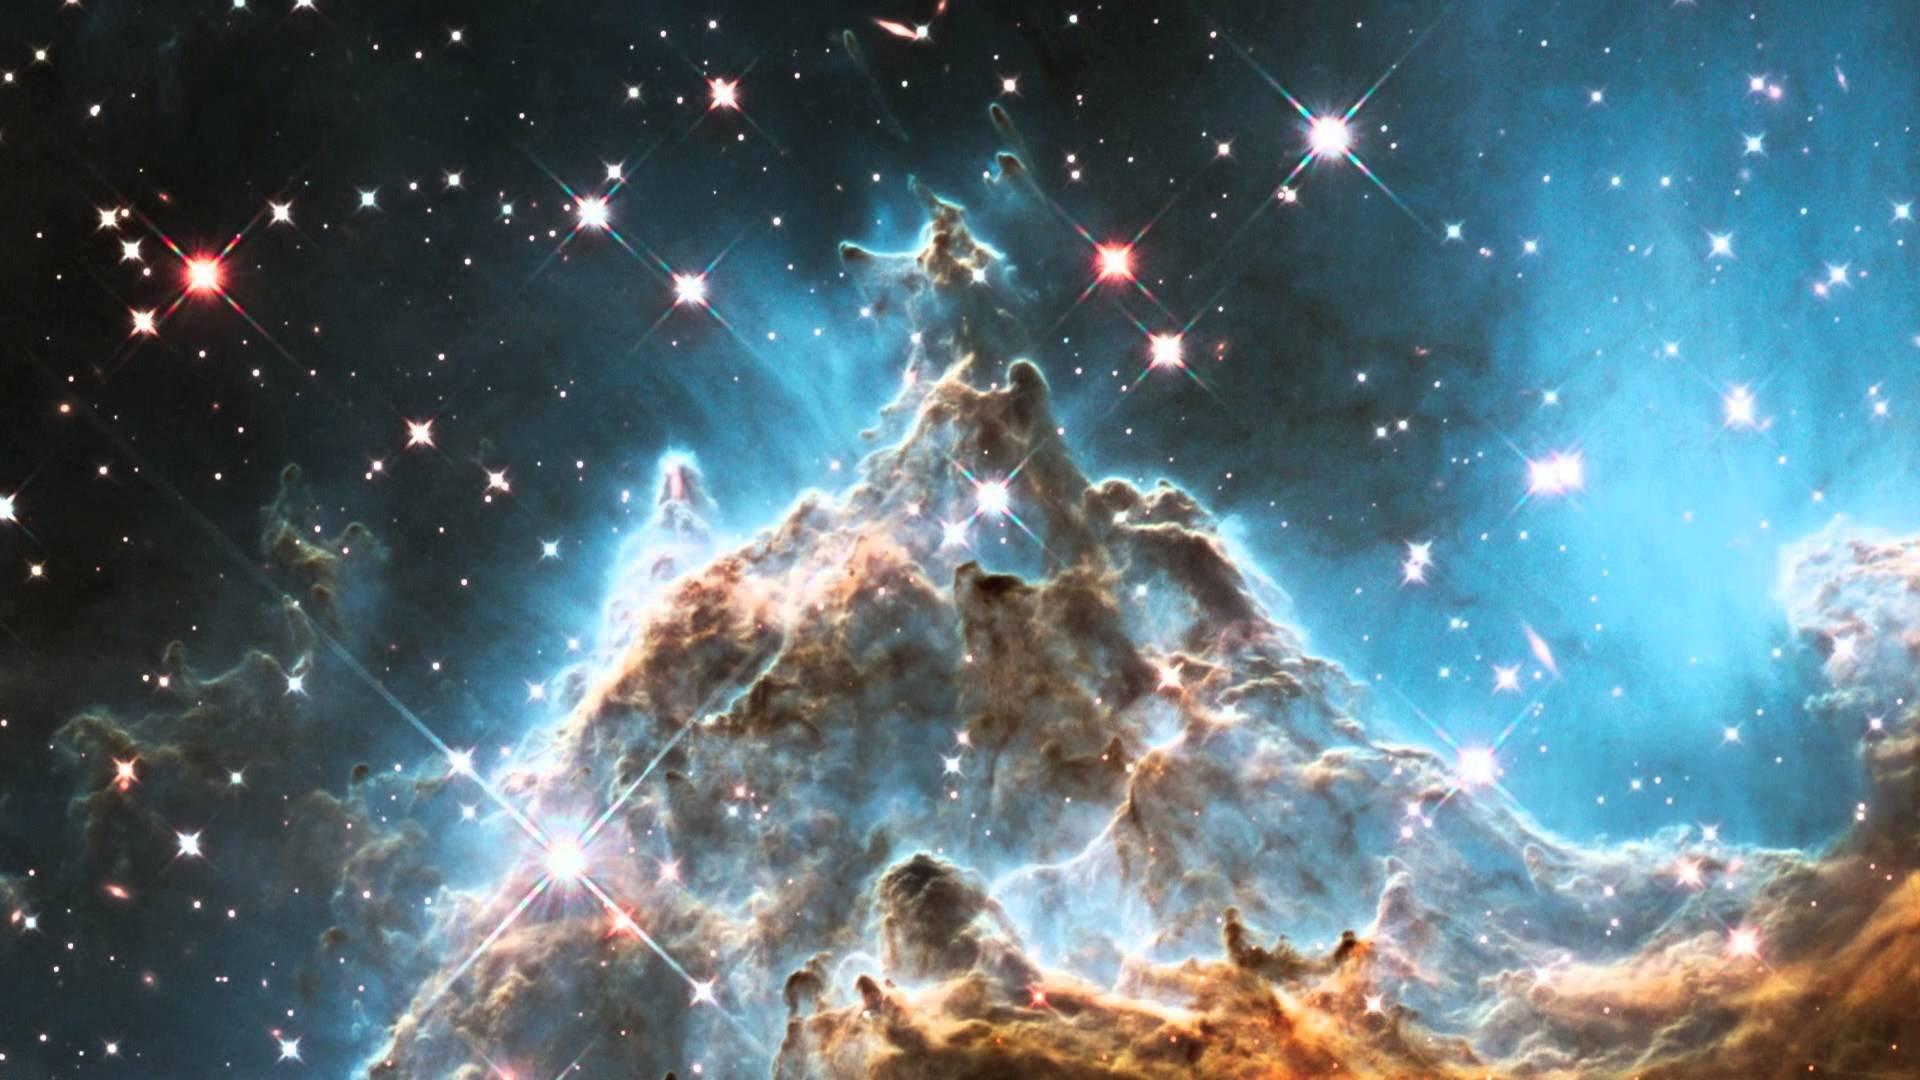 Cool Video Game Wallpapers Hd Download Free Hubble Wallpapers 1920x1080 Pixelstalk Net